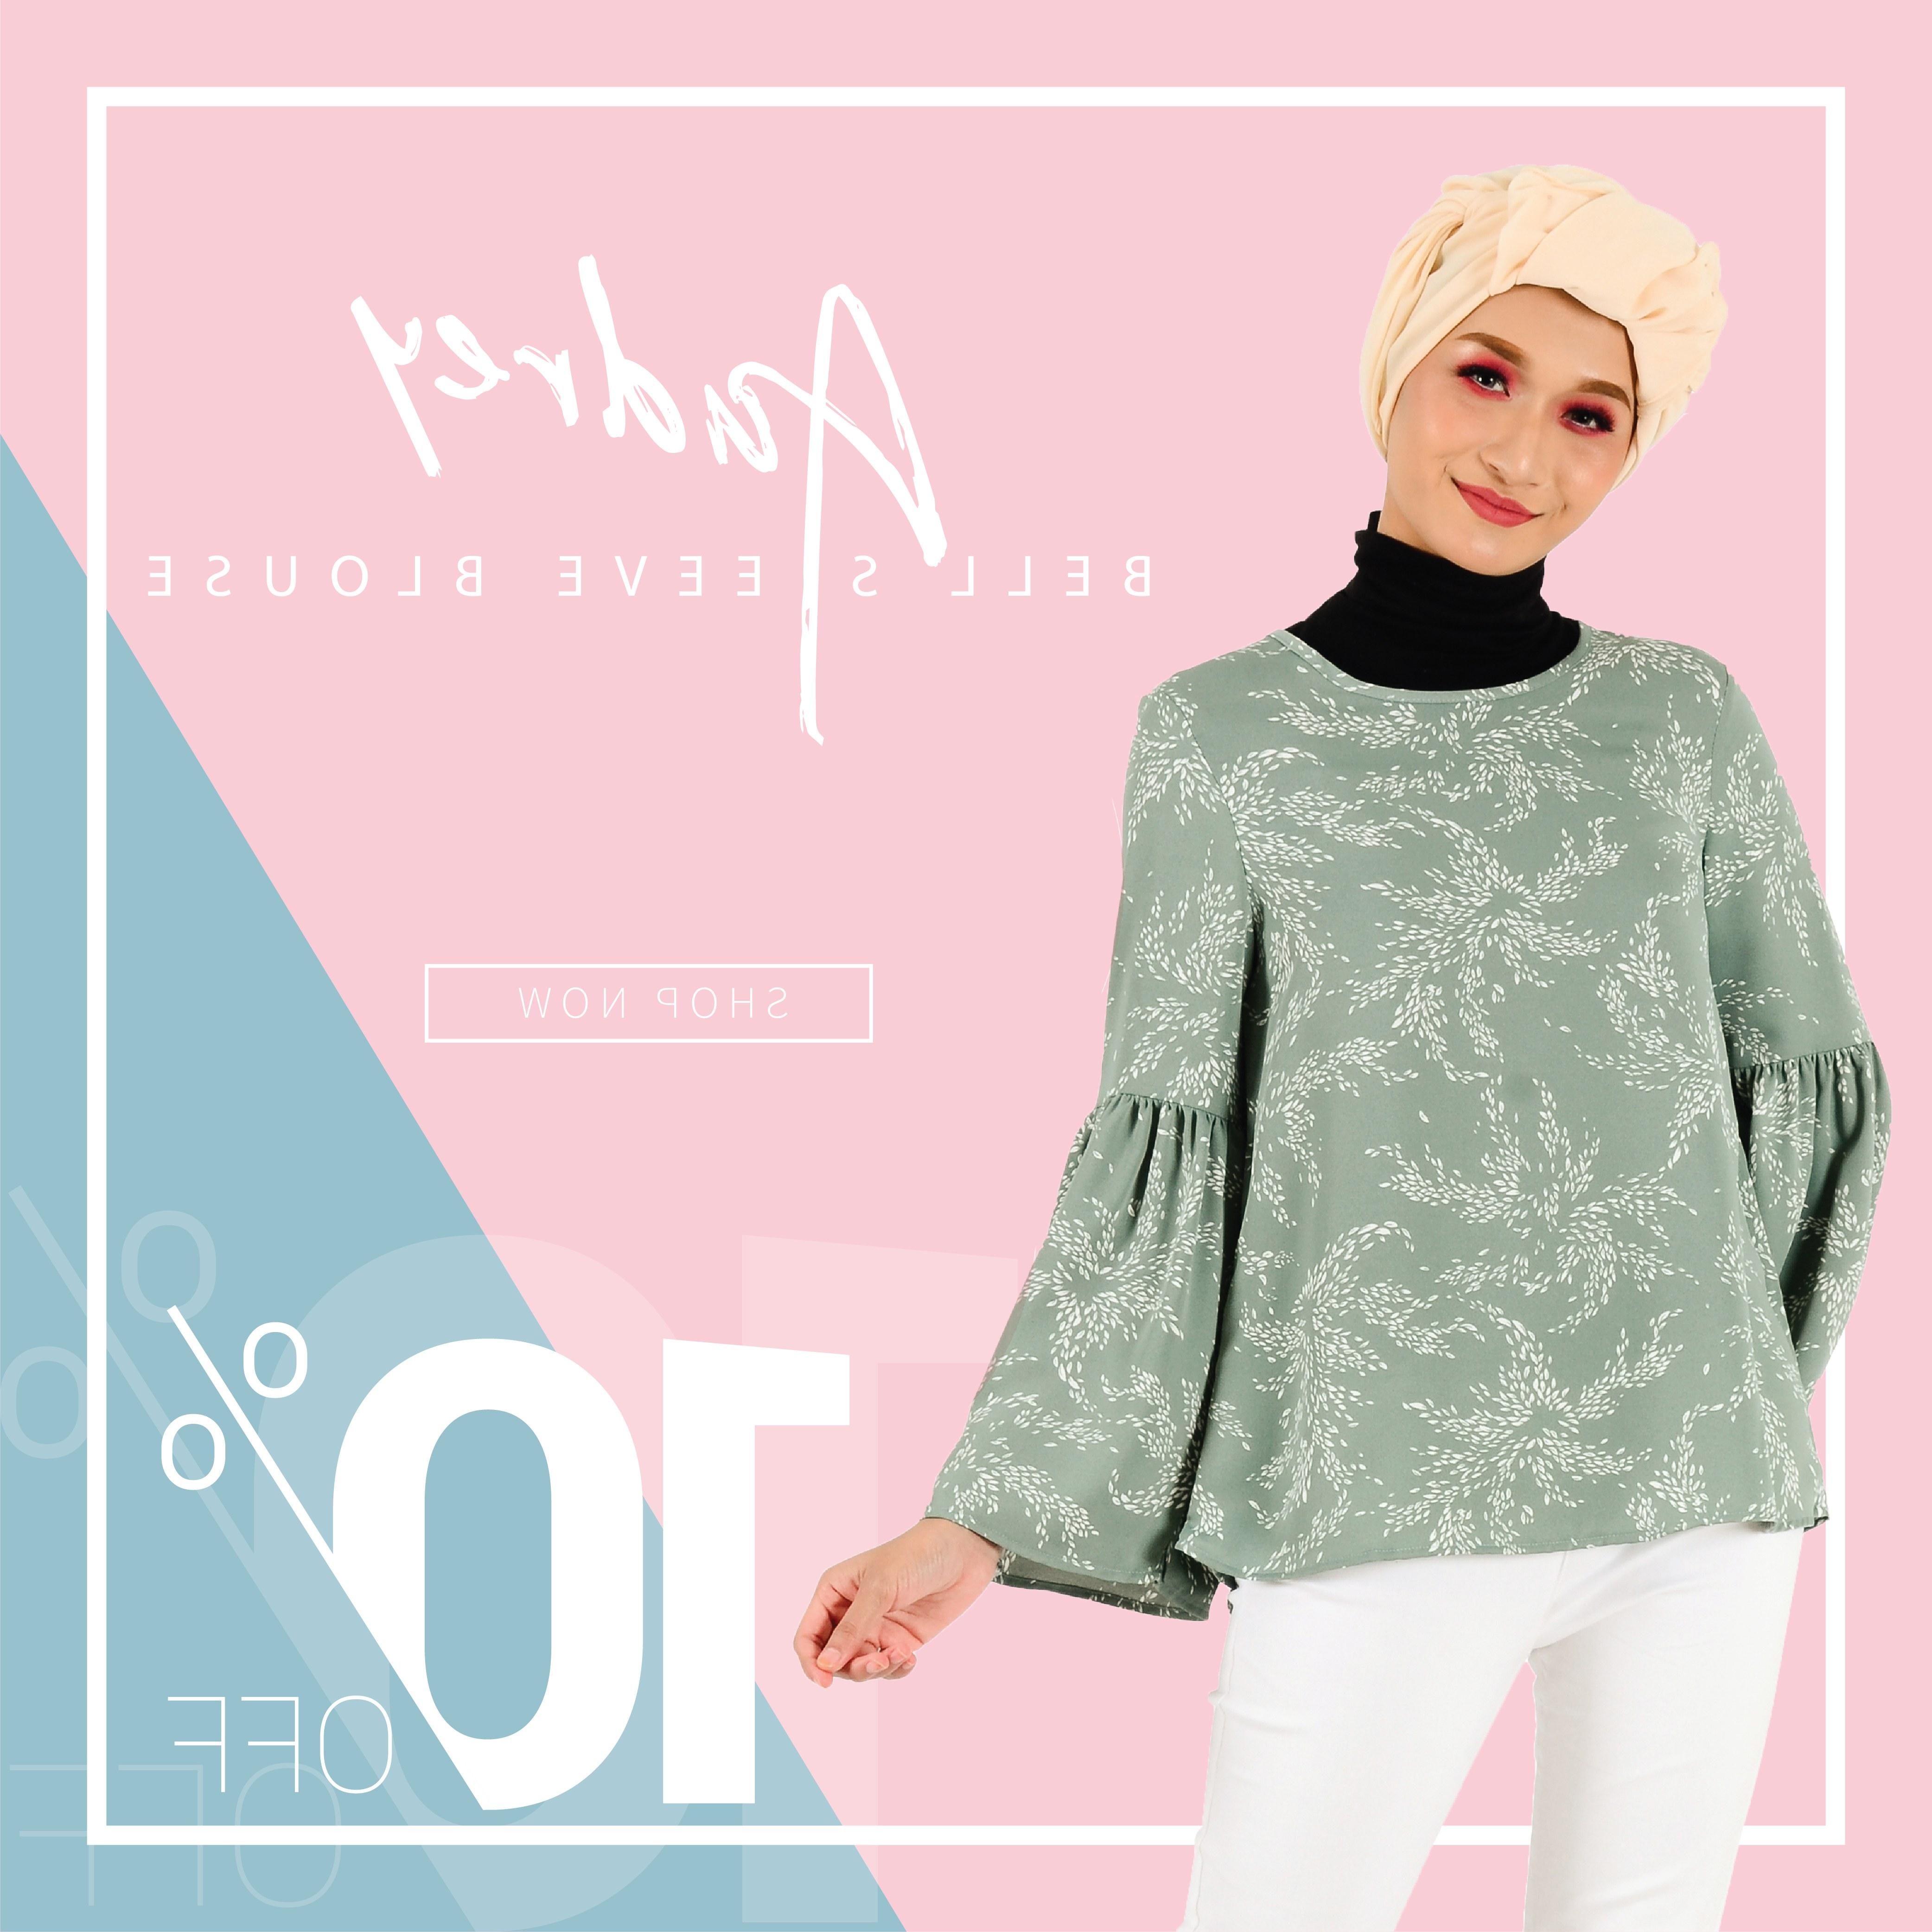 Design Desain Baju Pengantin Muslimah E6d5 Mytrend S Muslimah Fashion Blog